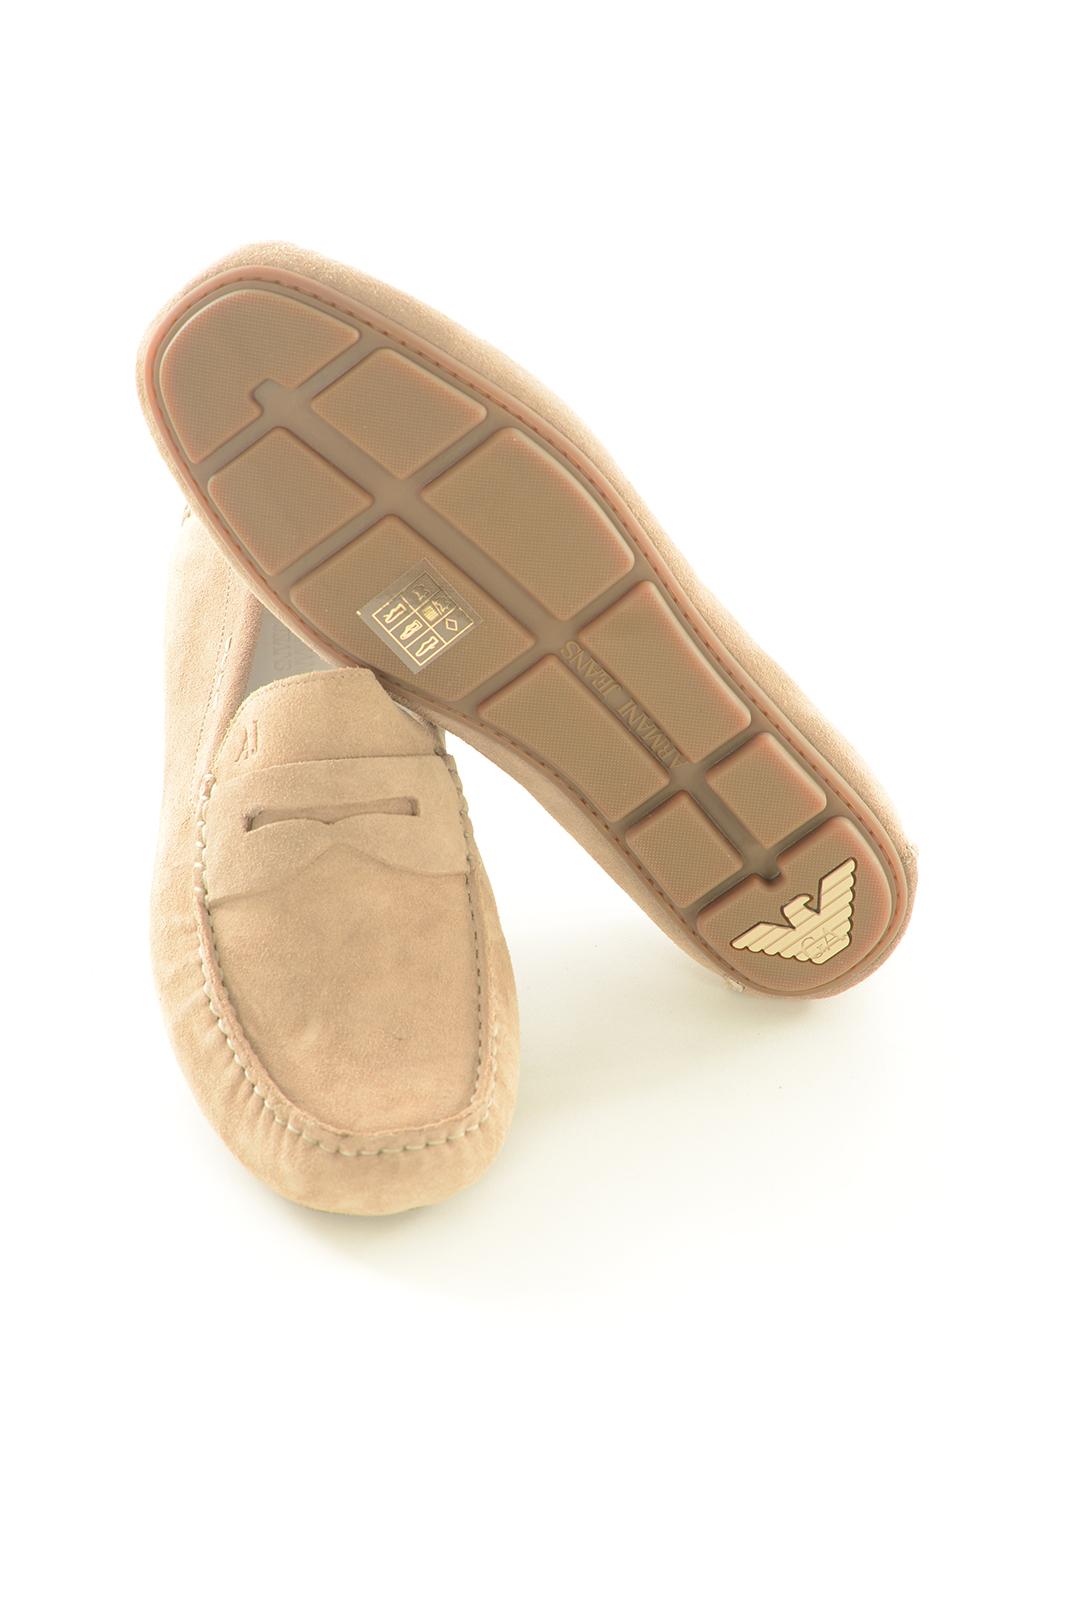 Chaussures   Armani jeans 06588 55 D1